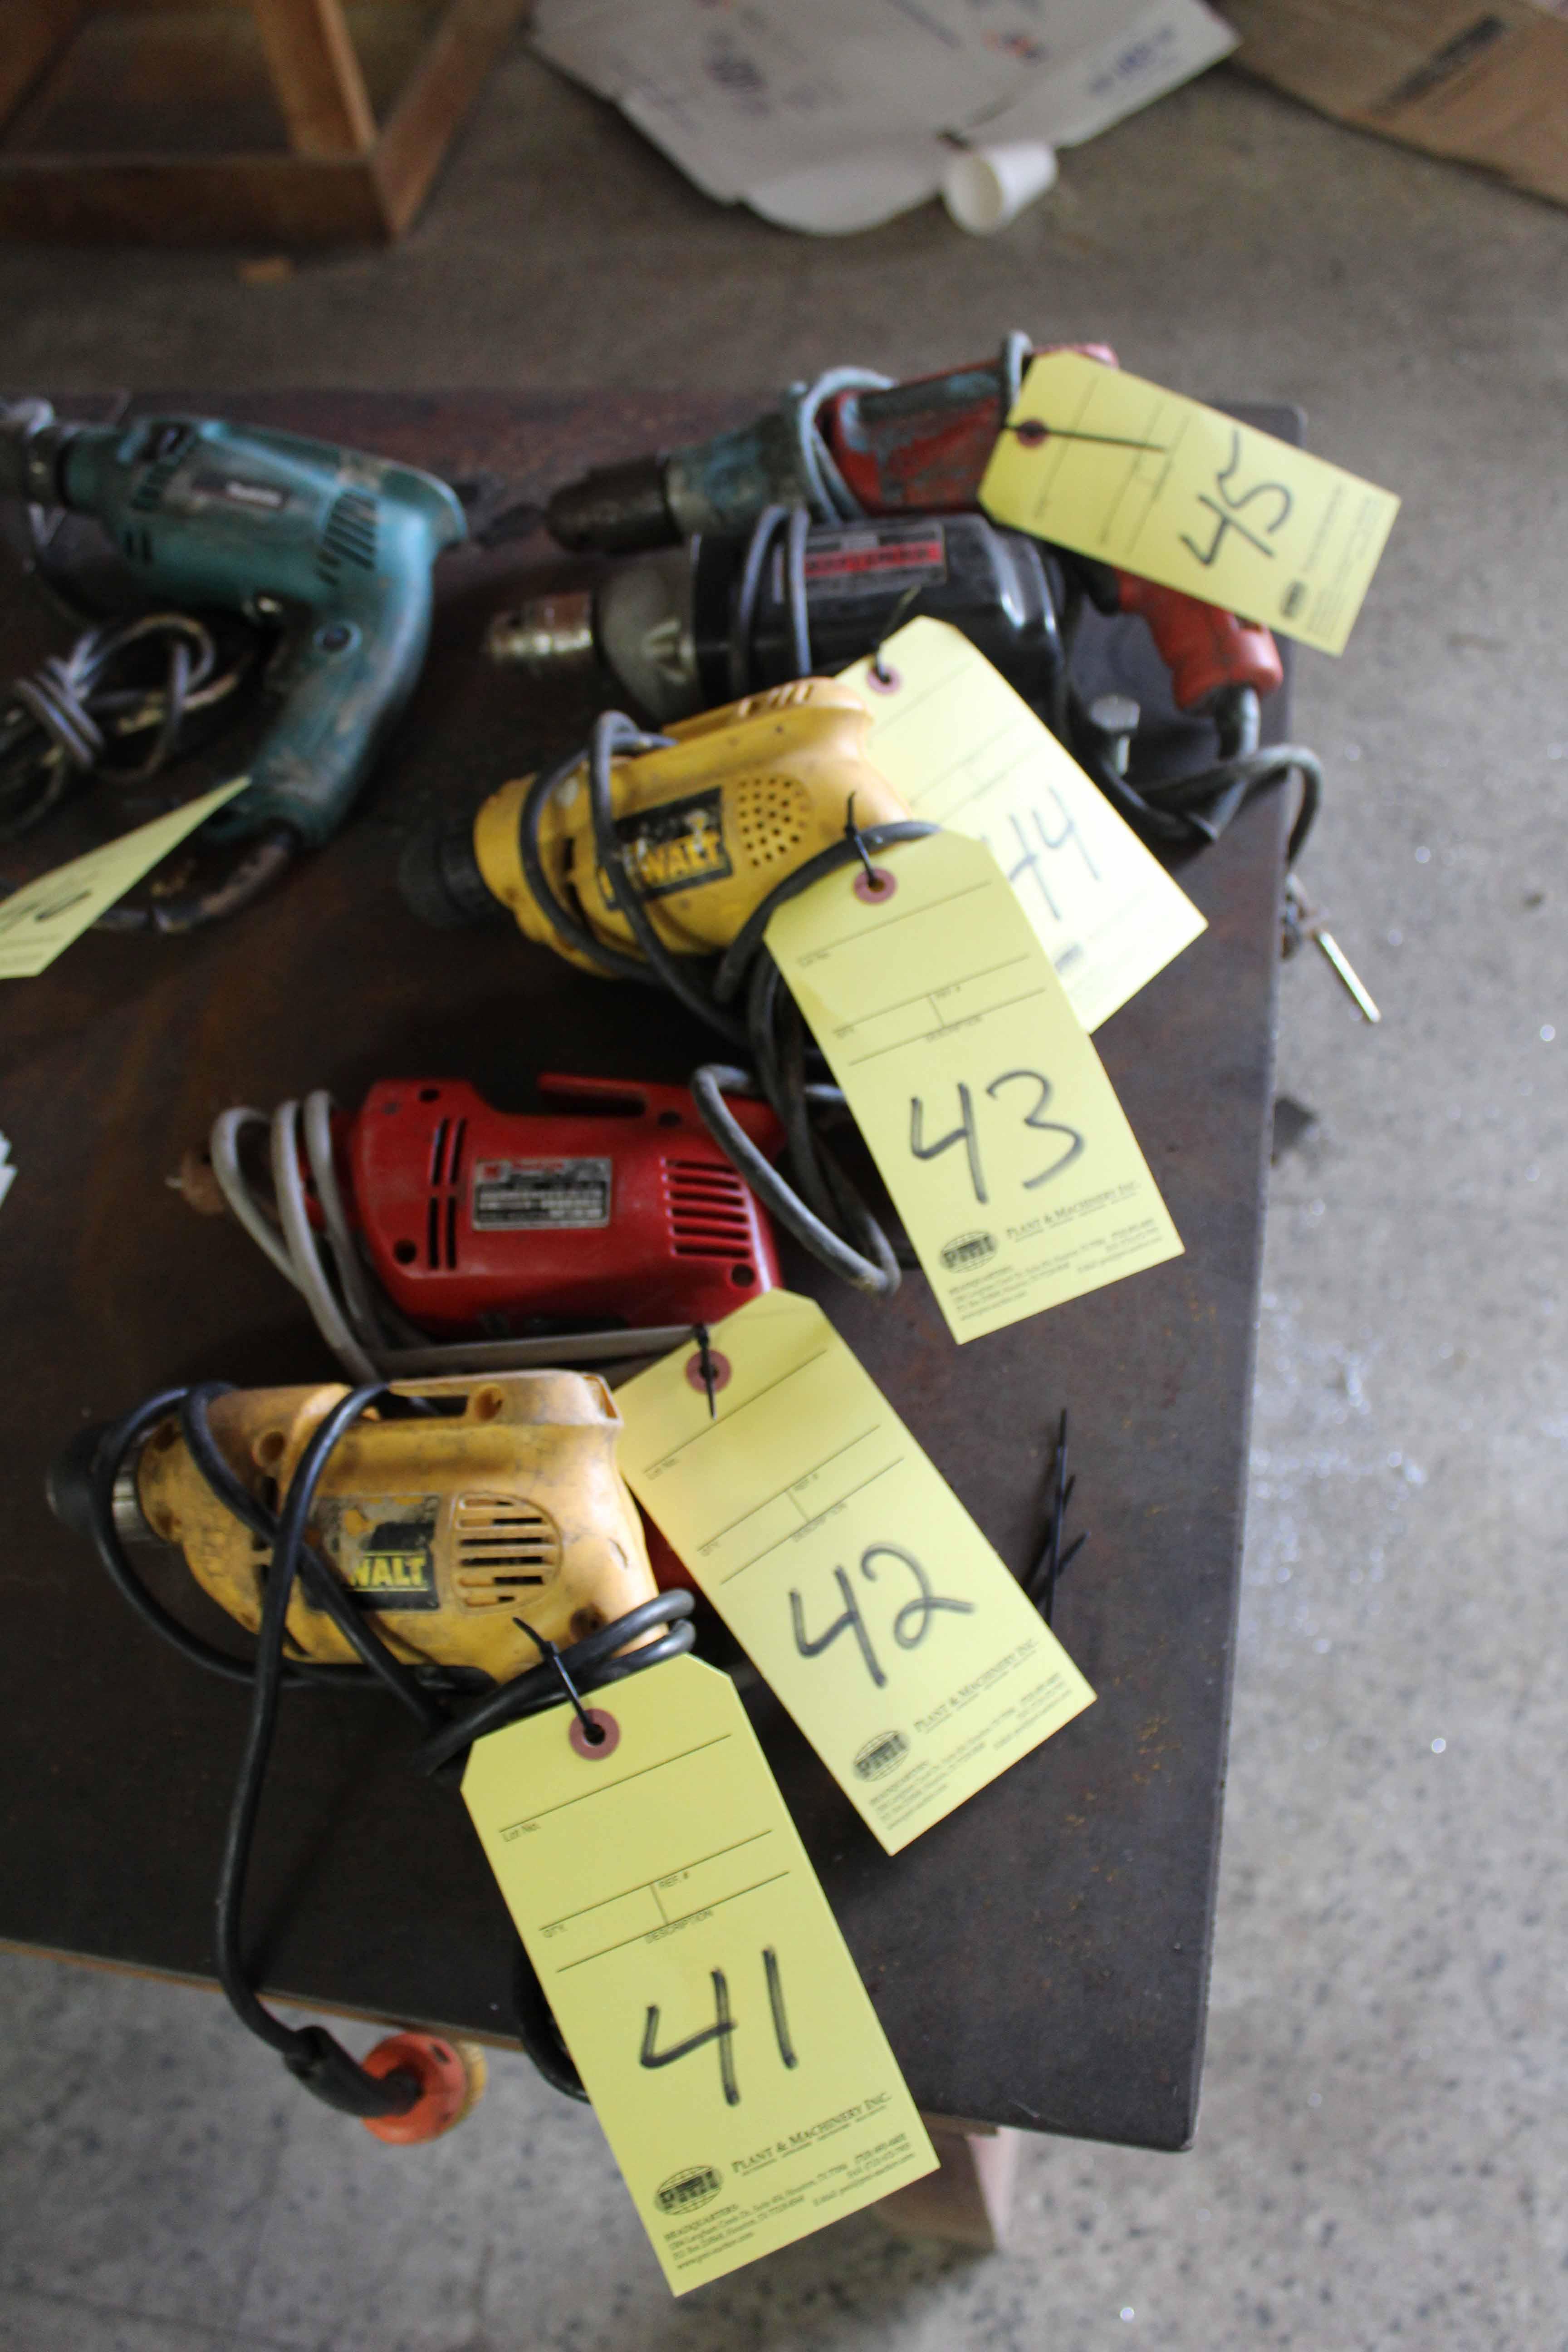 Lot 44 - ELECTRIC HAND DRILL, BLACK & DECKER